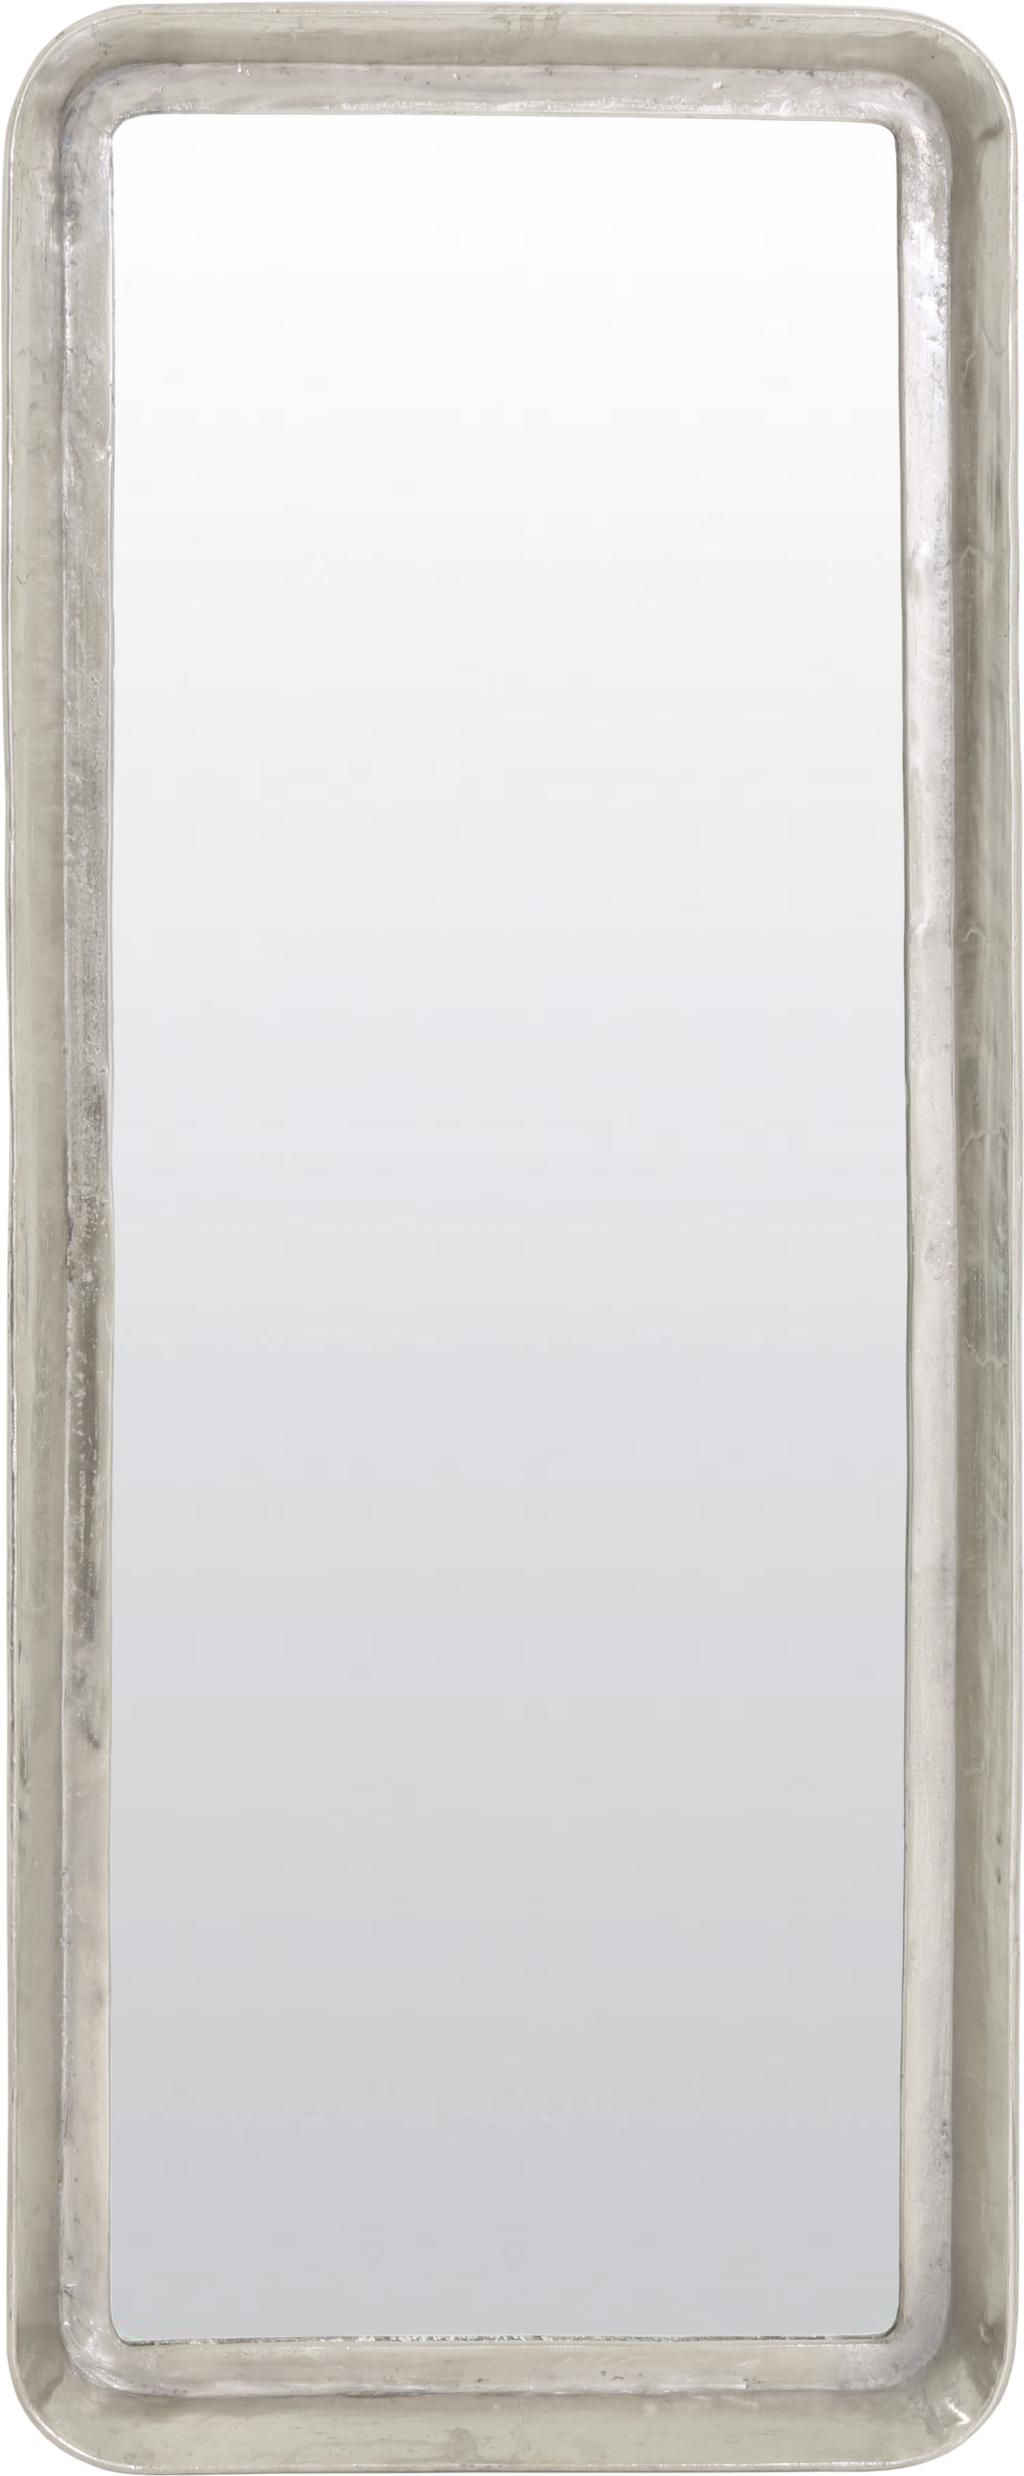 spiegel-perfect---61x11x148cm---ruw-nikkel---light-and-living[0].jpg